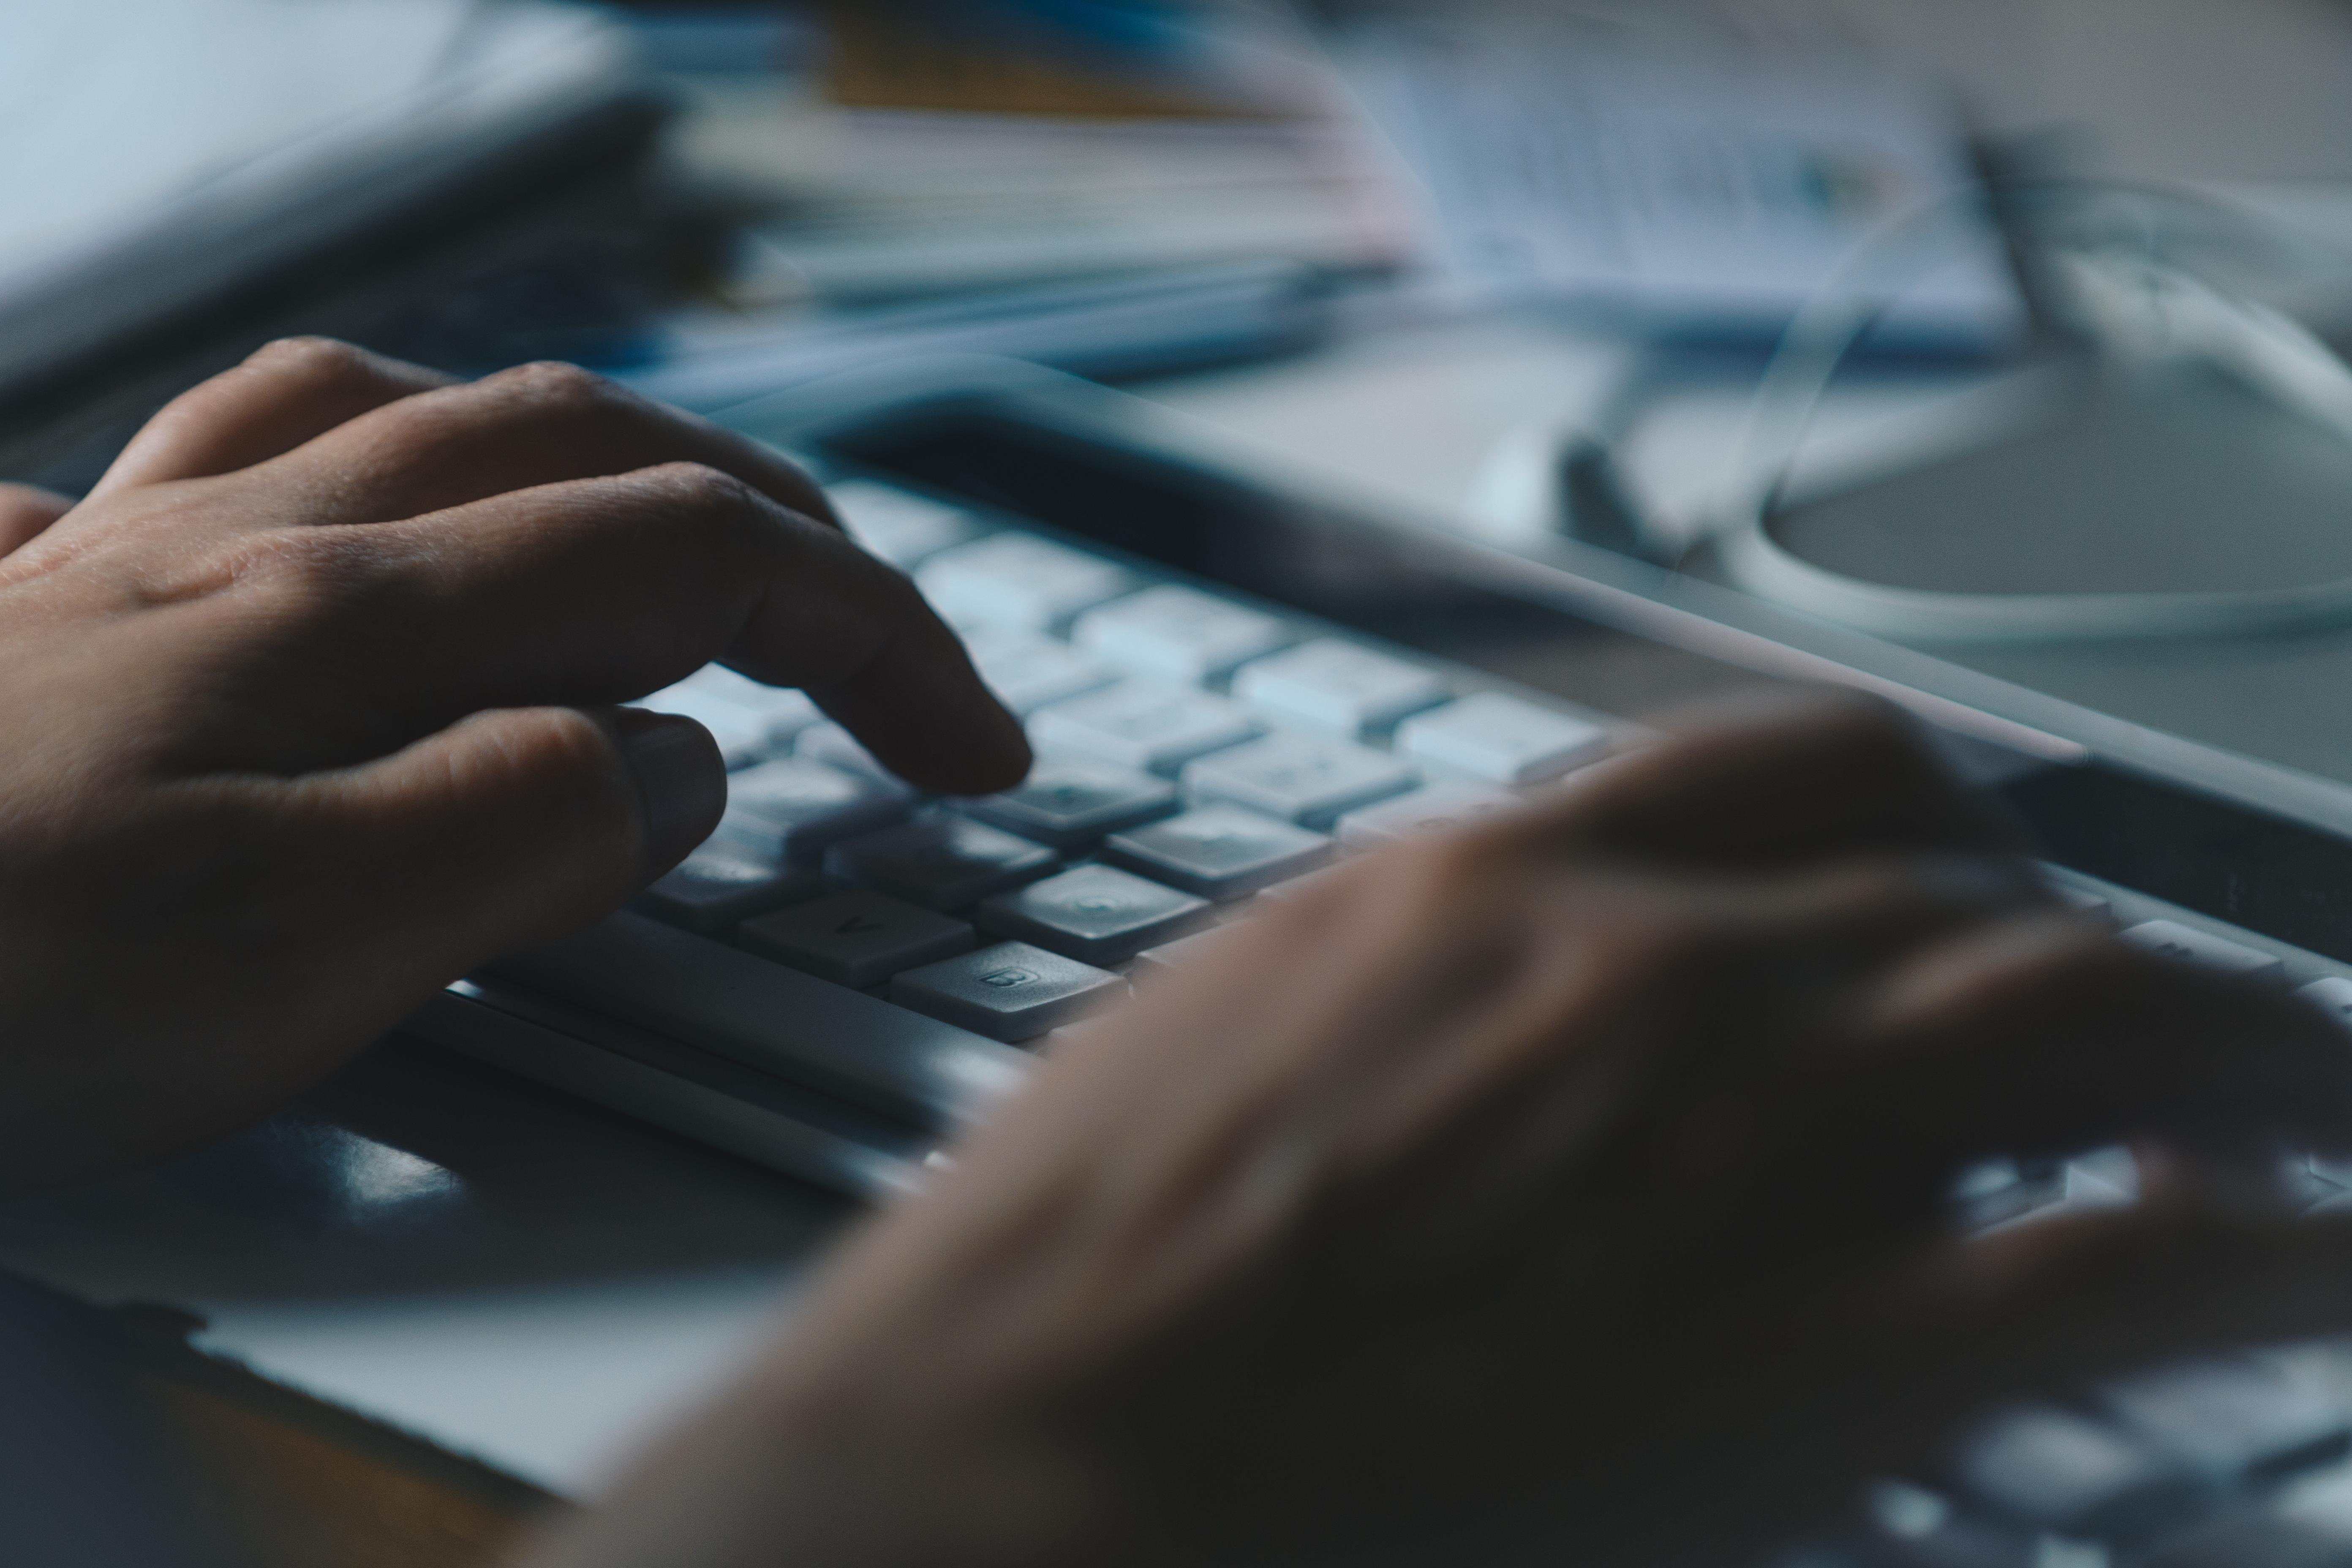 Writing using keyboard